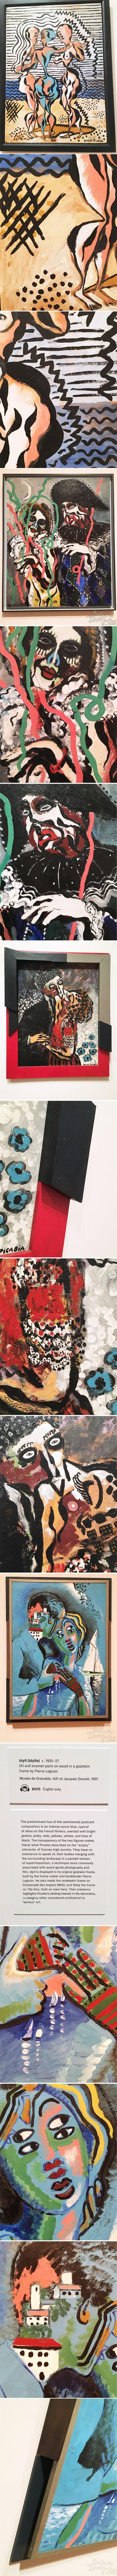 Picabia4-wm